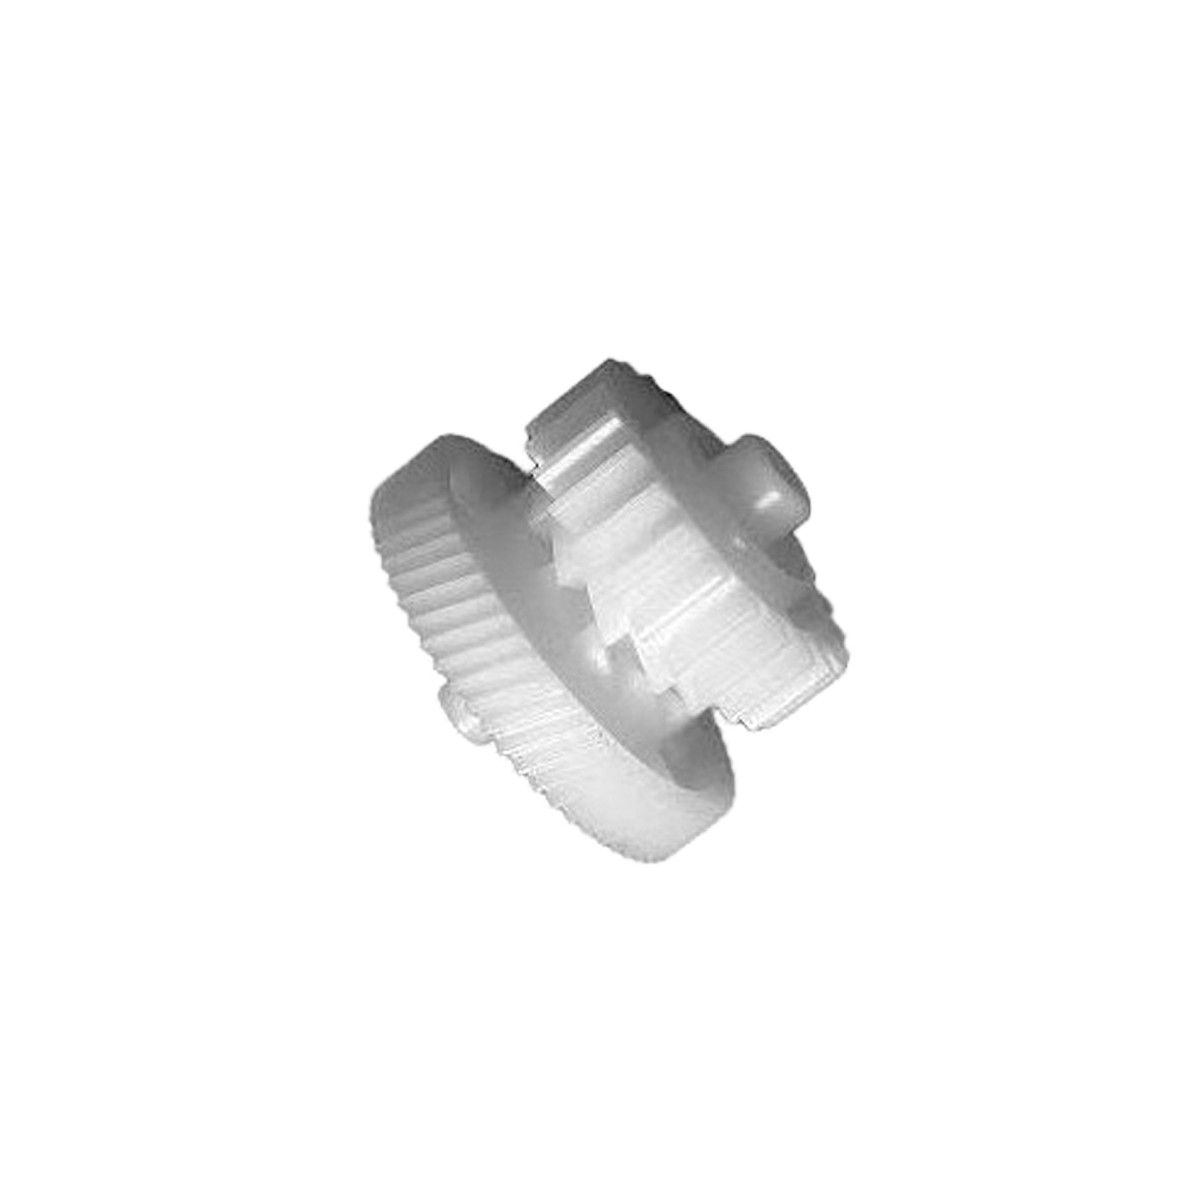 Engrenagem Drive Fusor HP | M125 M126 M127FN M128 P1102 | RU7-0753-000 | Compatível